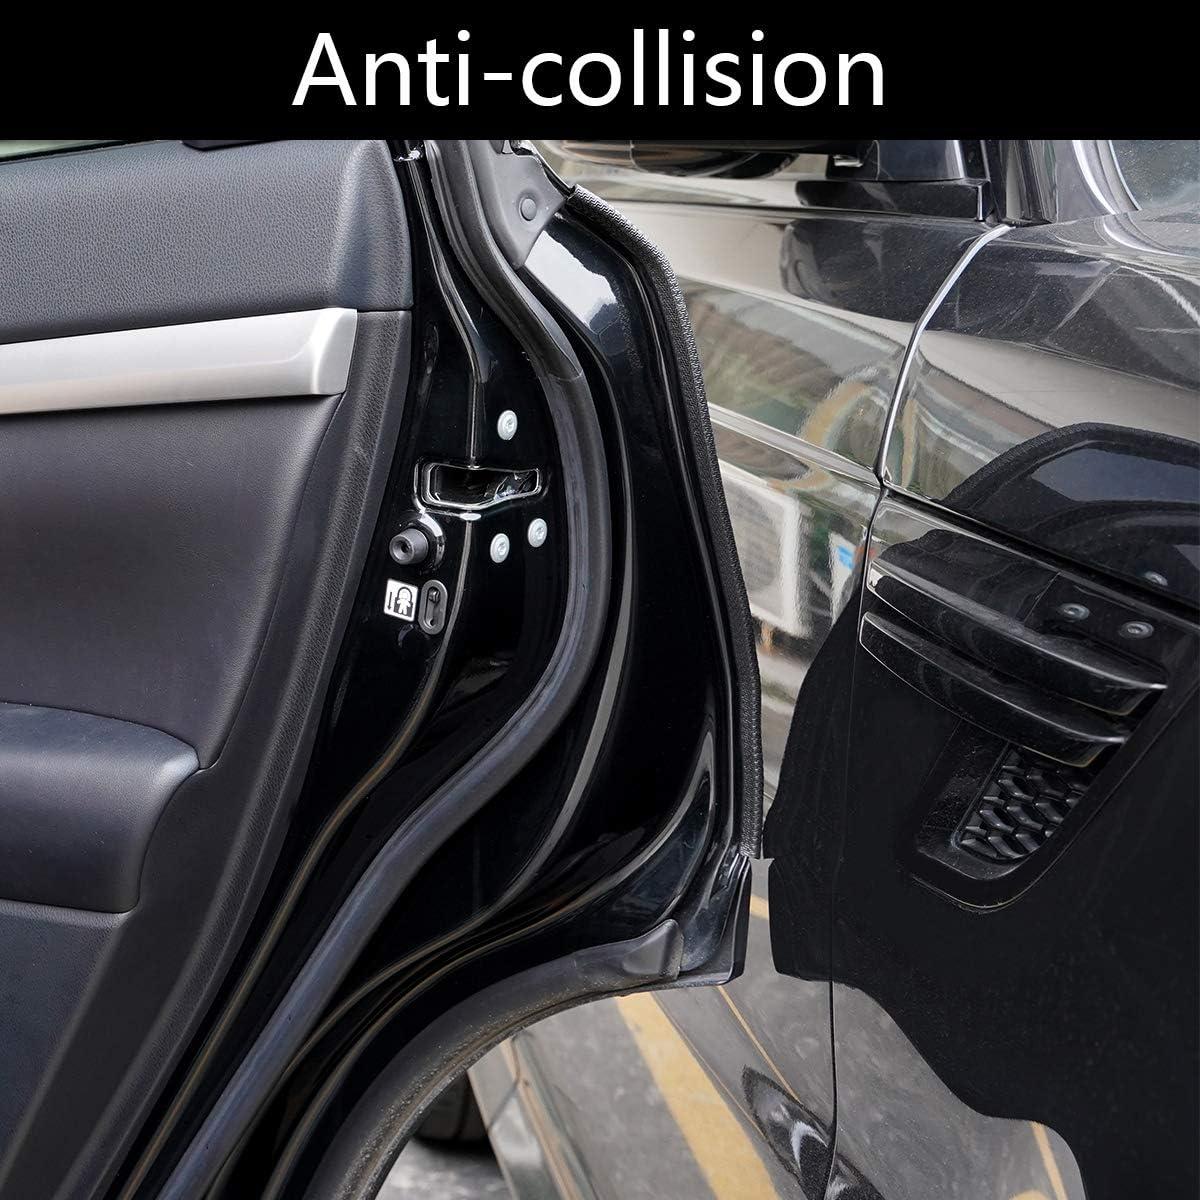 Senzeal 5M//16.4FT Car Door Edge Guards U Shape Rubber Car Door Protector Edge Trim Anti-collision Seal Strip Clips Fit for Most Cars Black